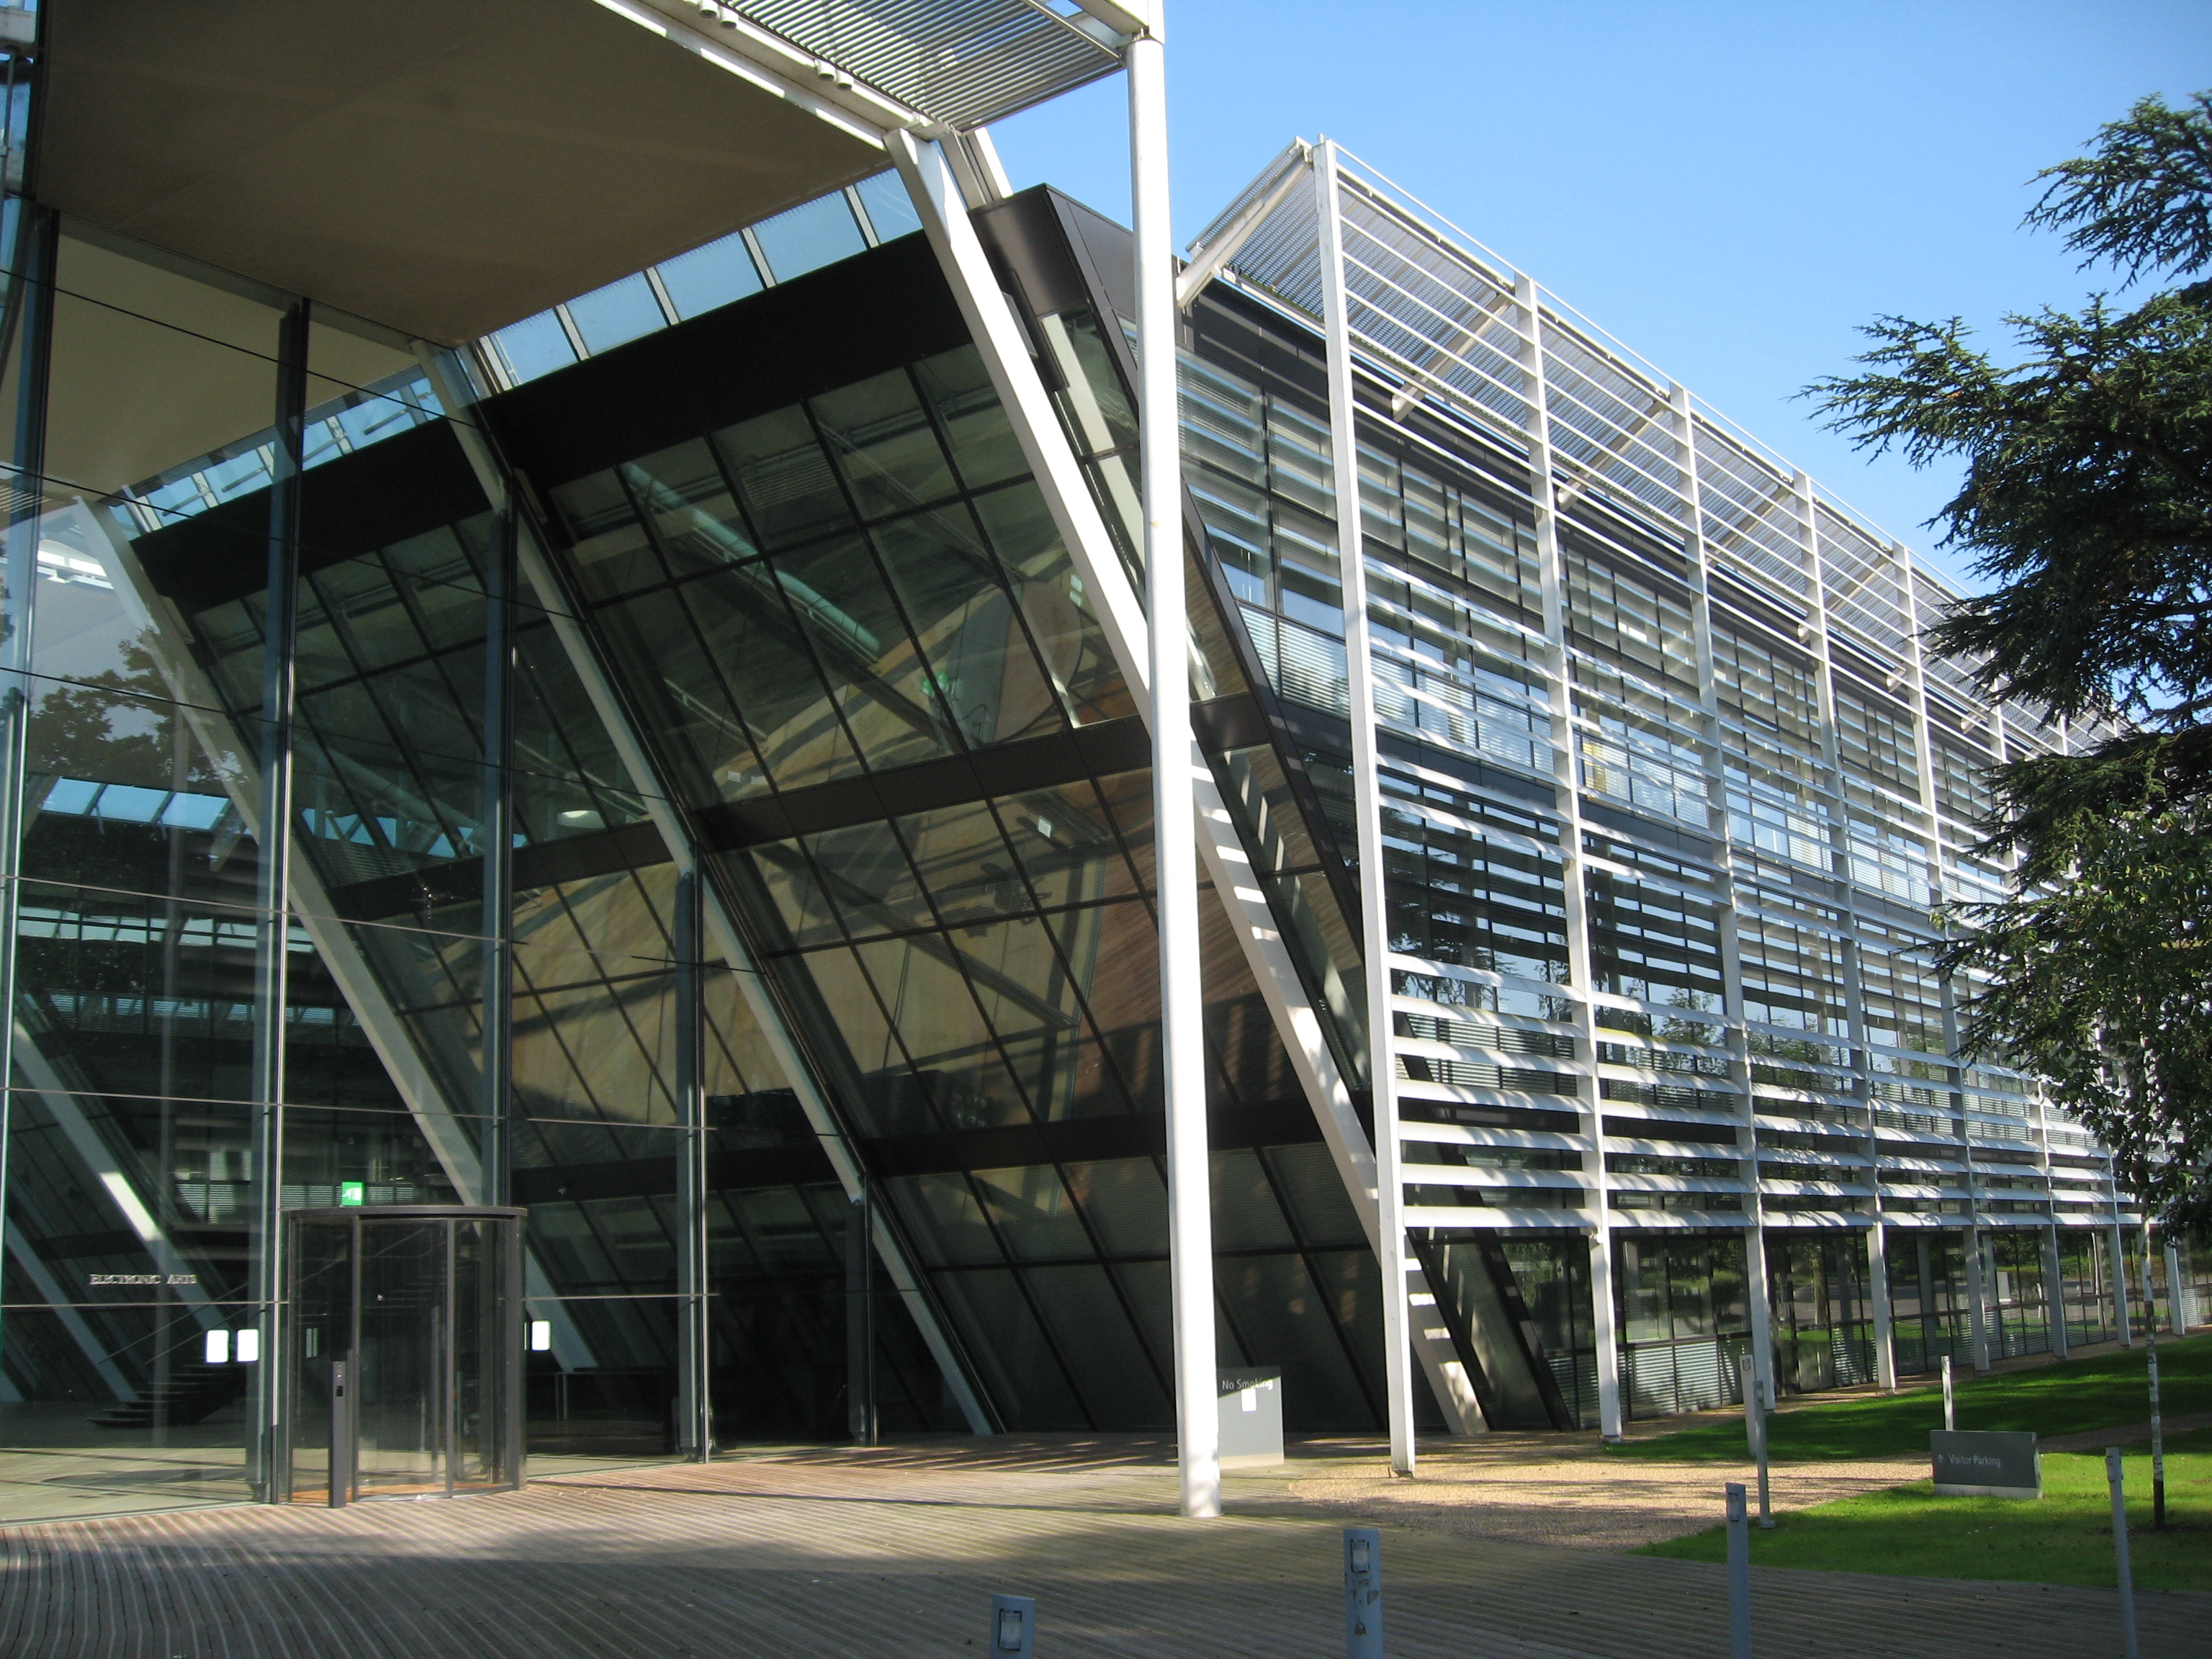 File:EA building, Chertsey, Surrey.jpg - Wikimedia Commons